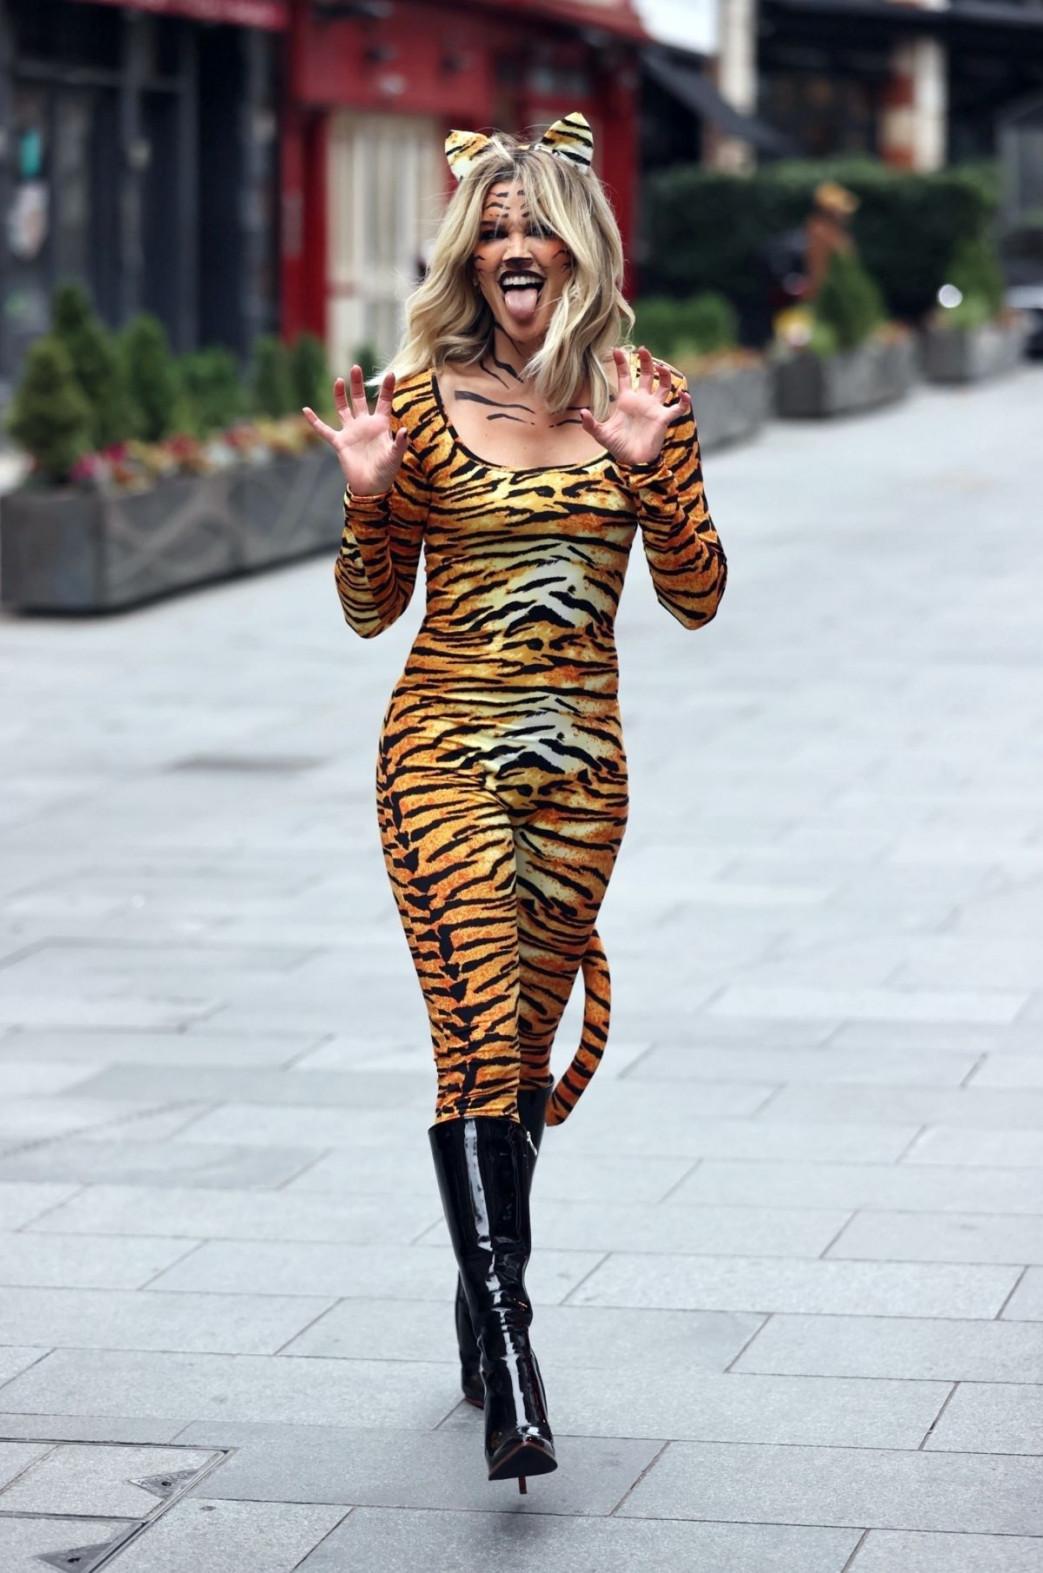 Ashley-Roberts-Stunning-in-Tiger-Catsuit-6.jpg